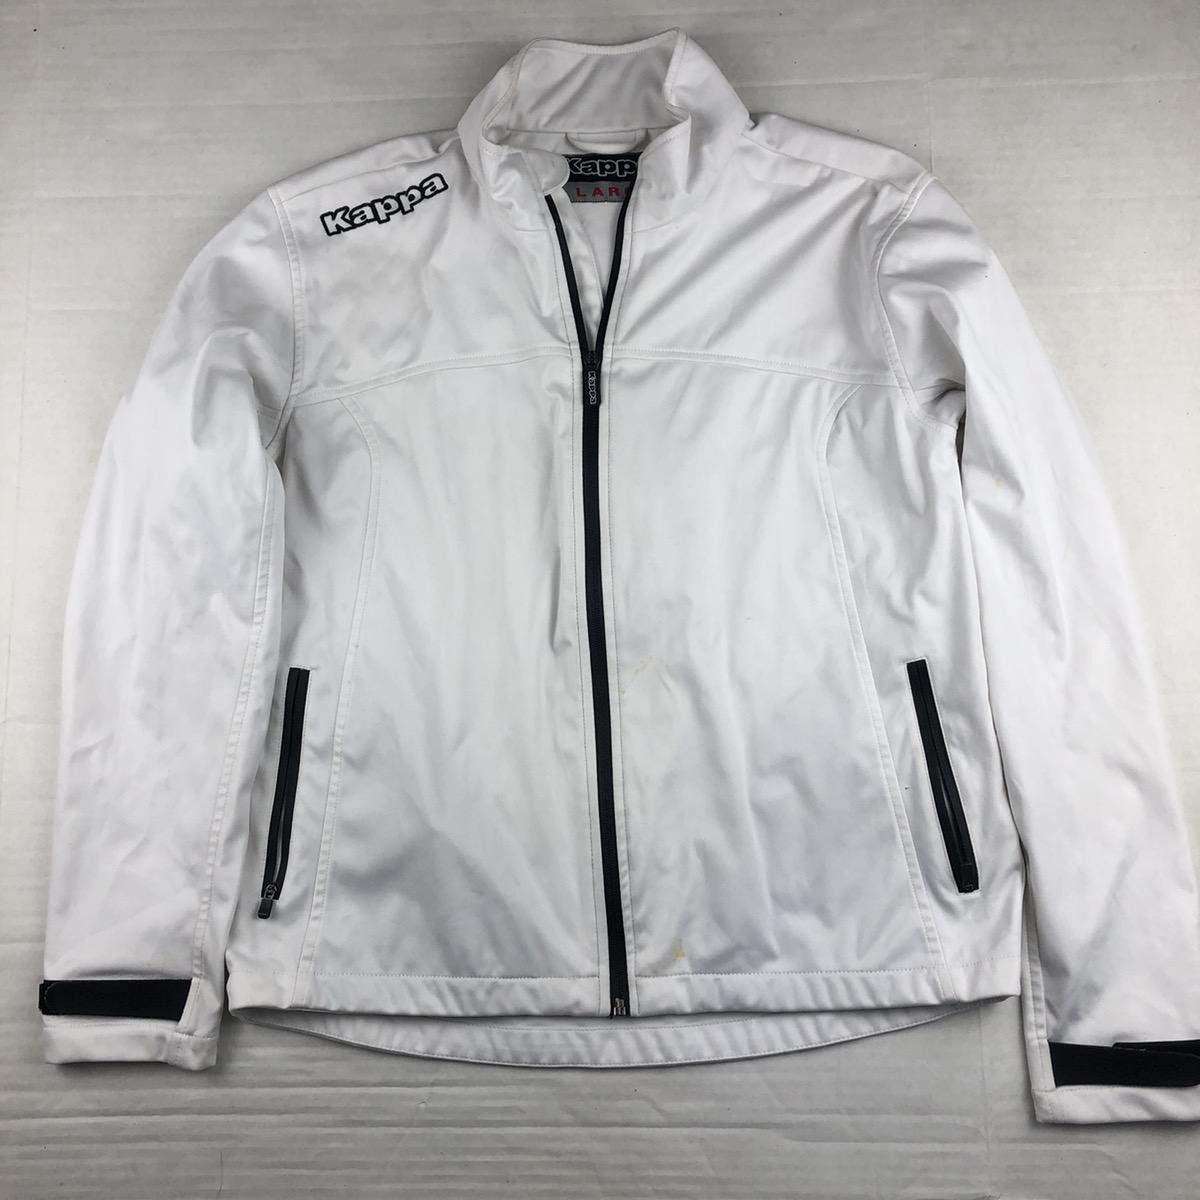 Vintage 90s Kappa Light Gray Zip Up Track Jacket